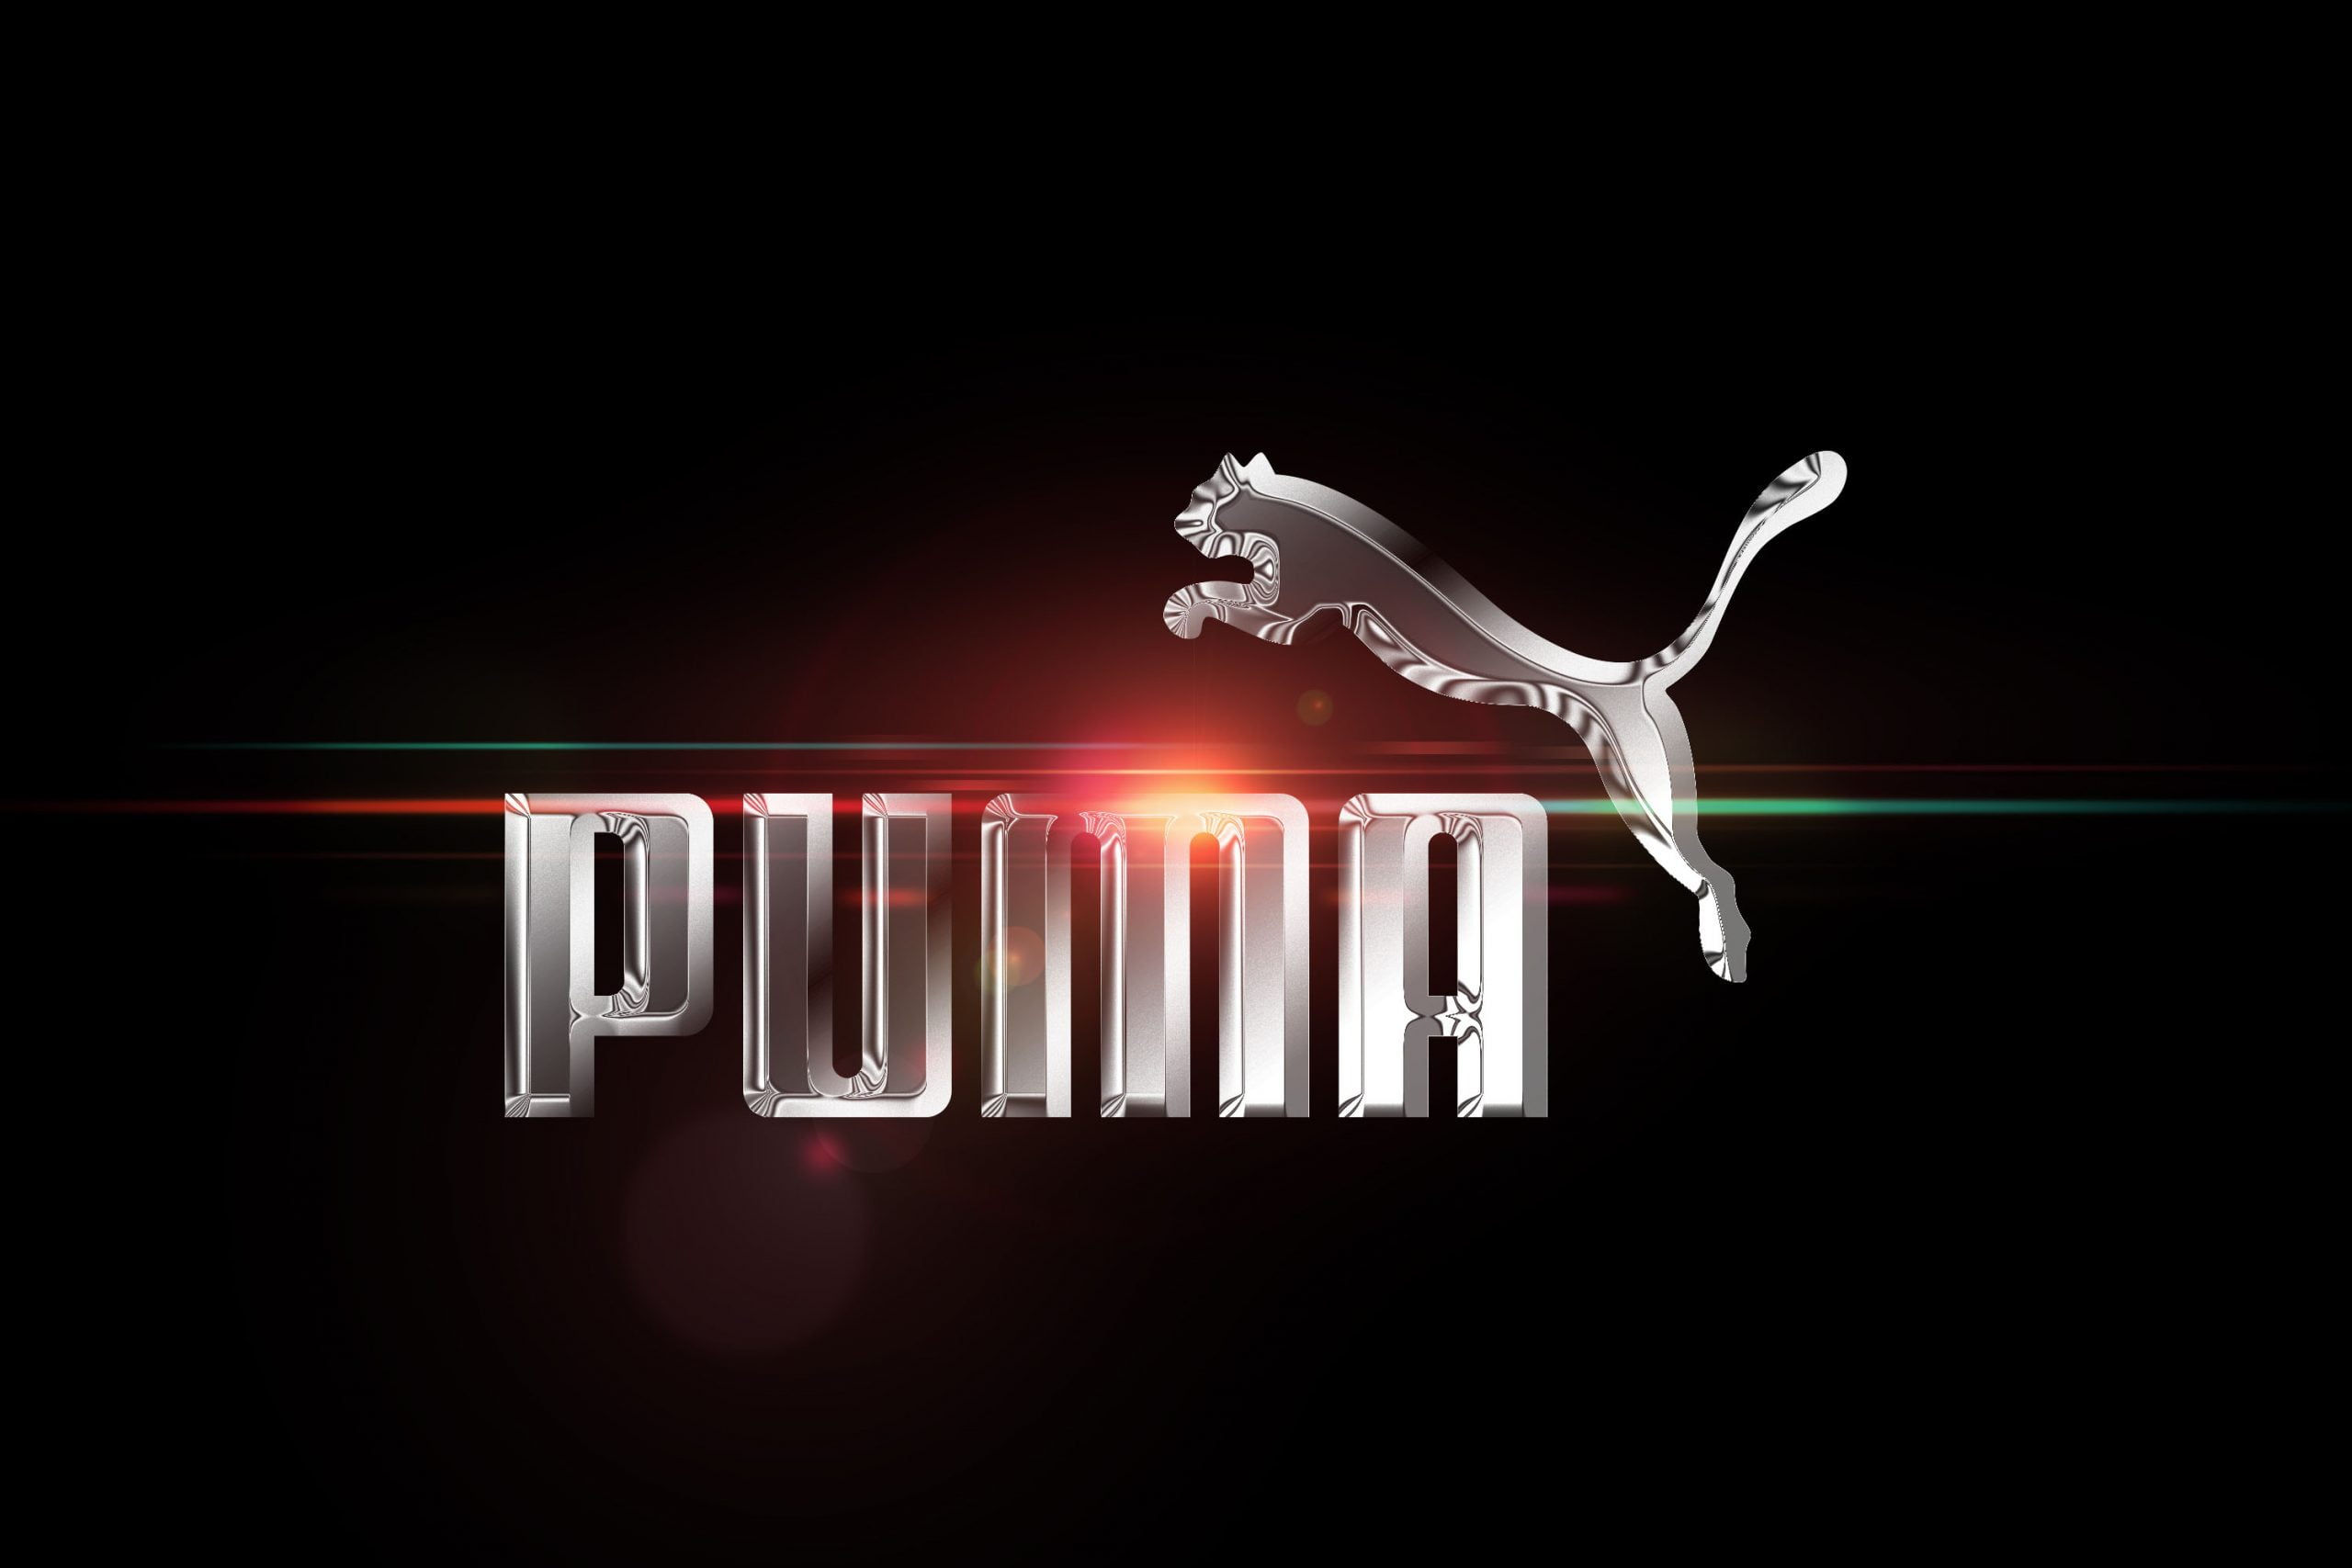 Chrome Effect Logo Mockup Puma